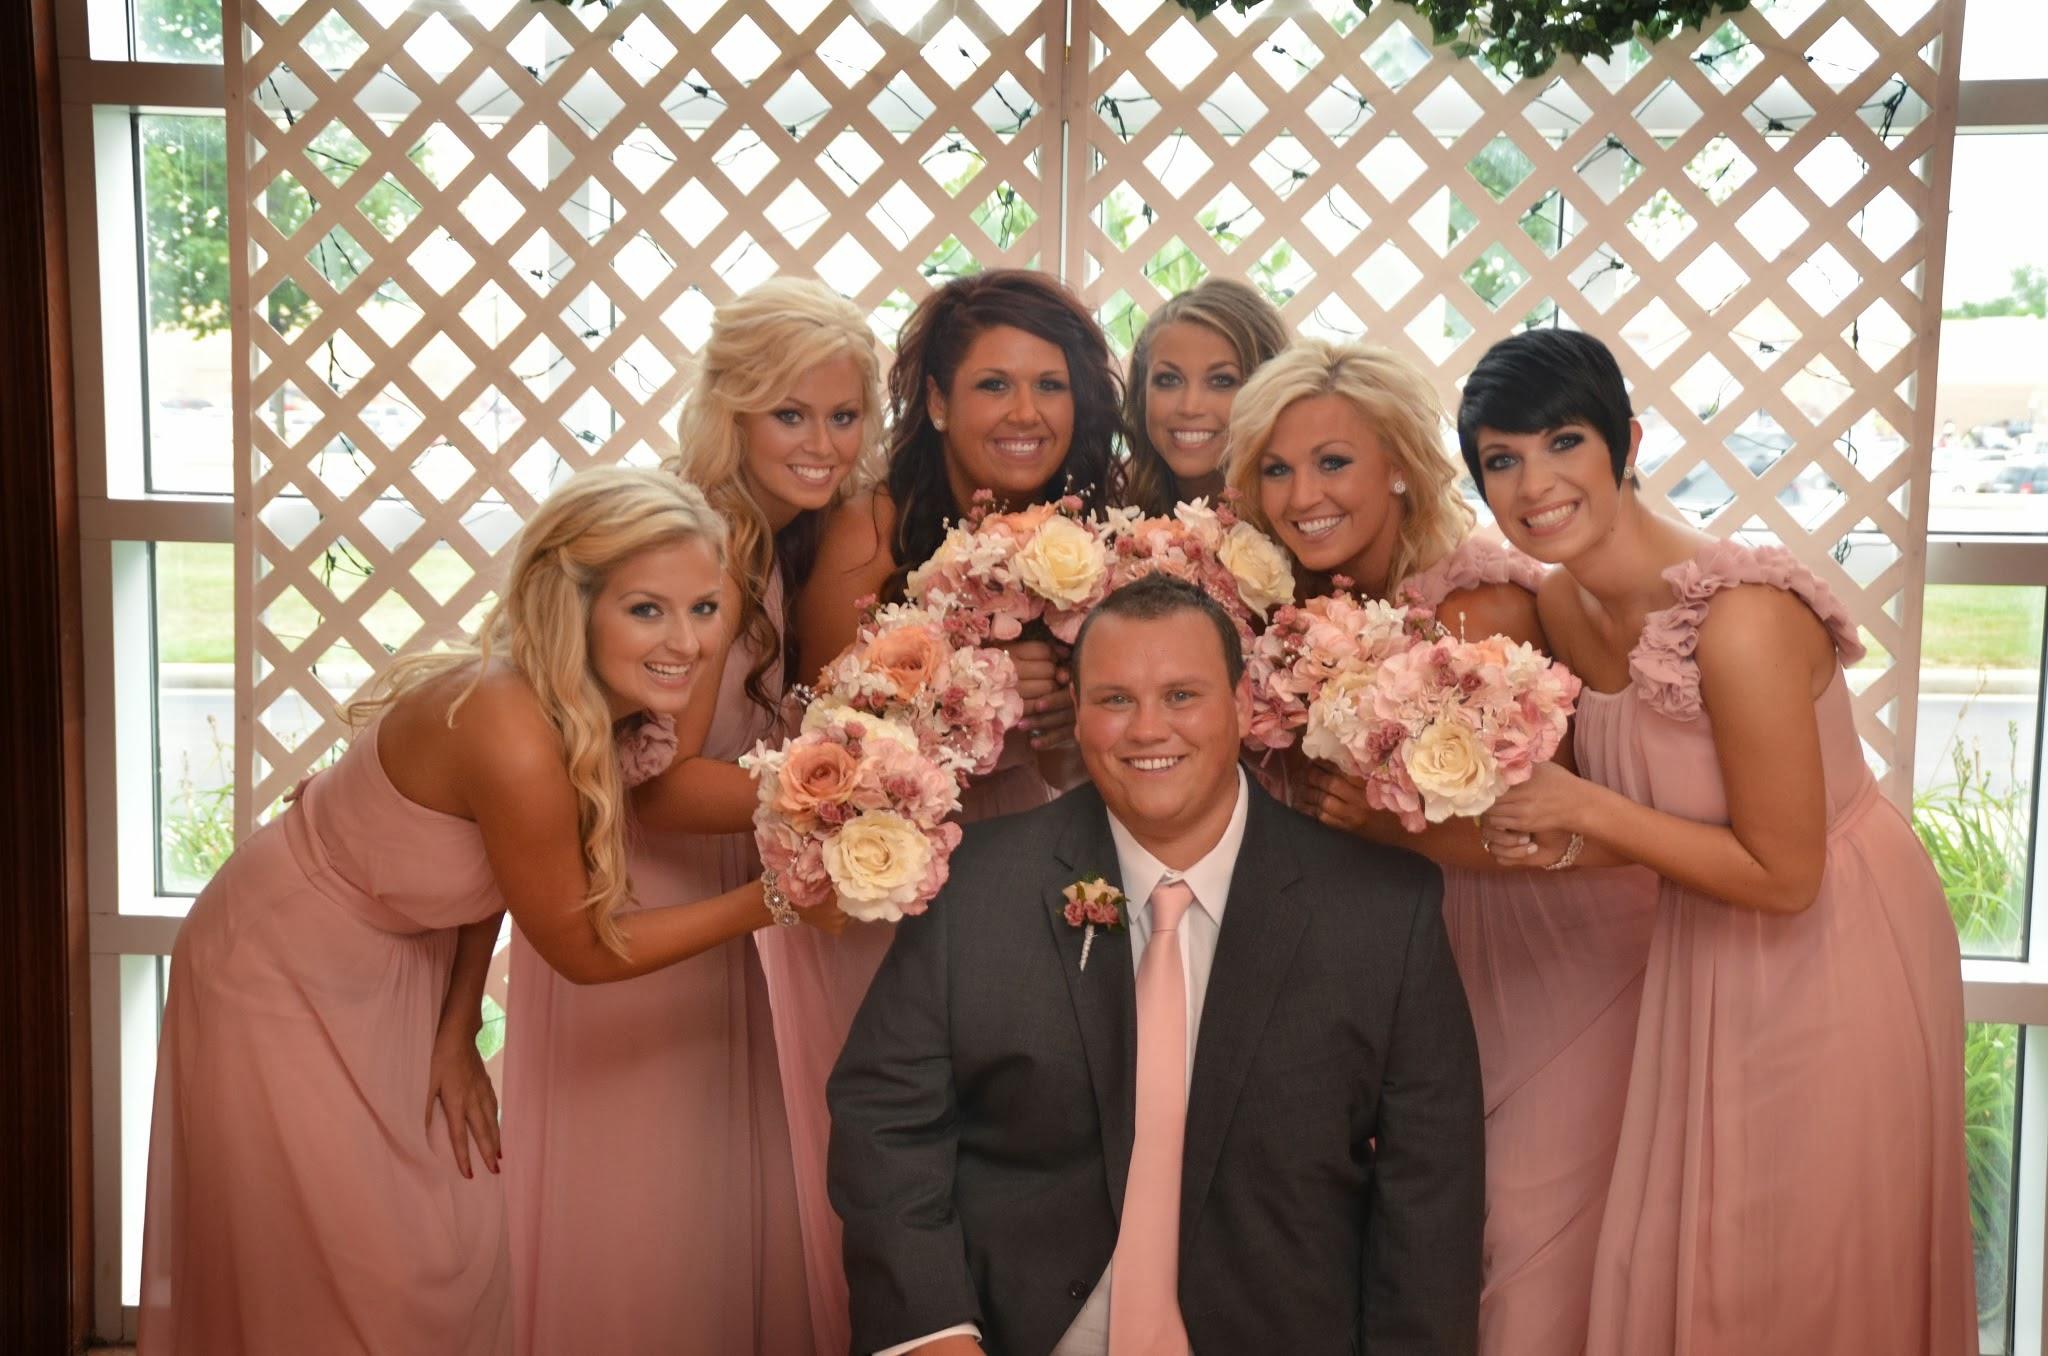 Emilee and Cole_s Wedding Photos 297.5.jpg